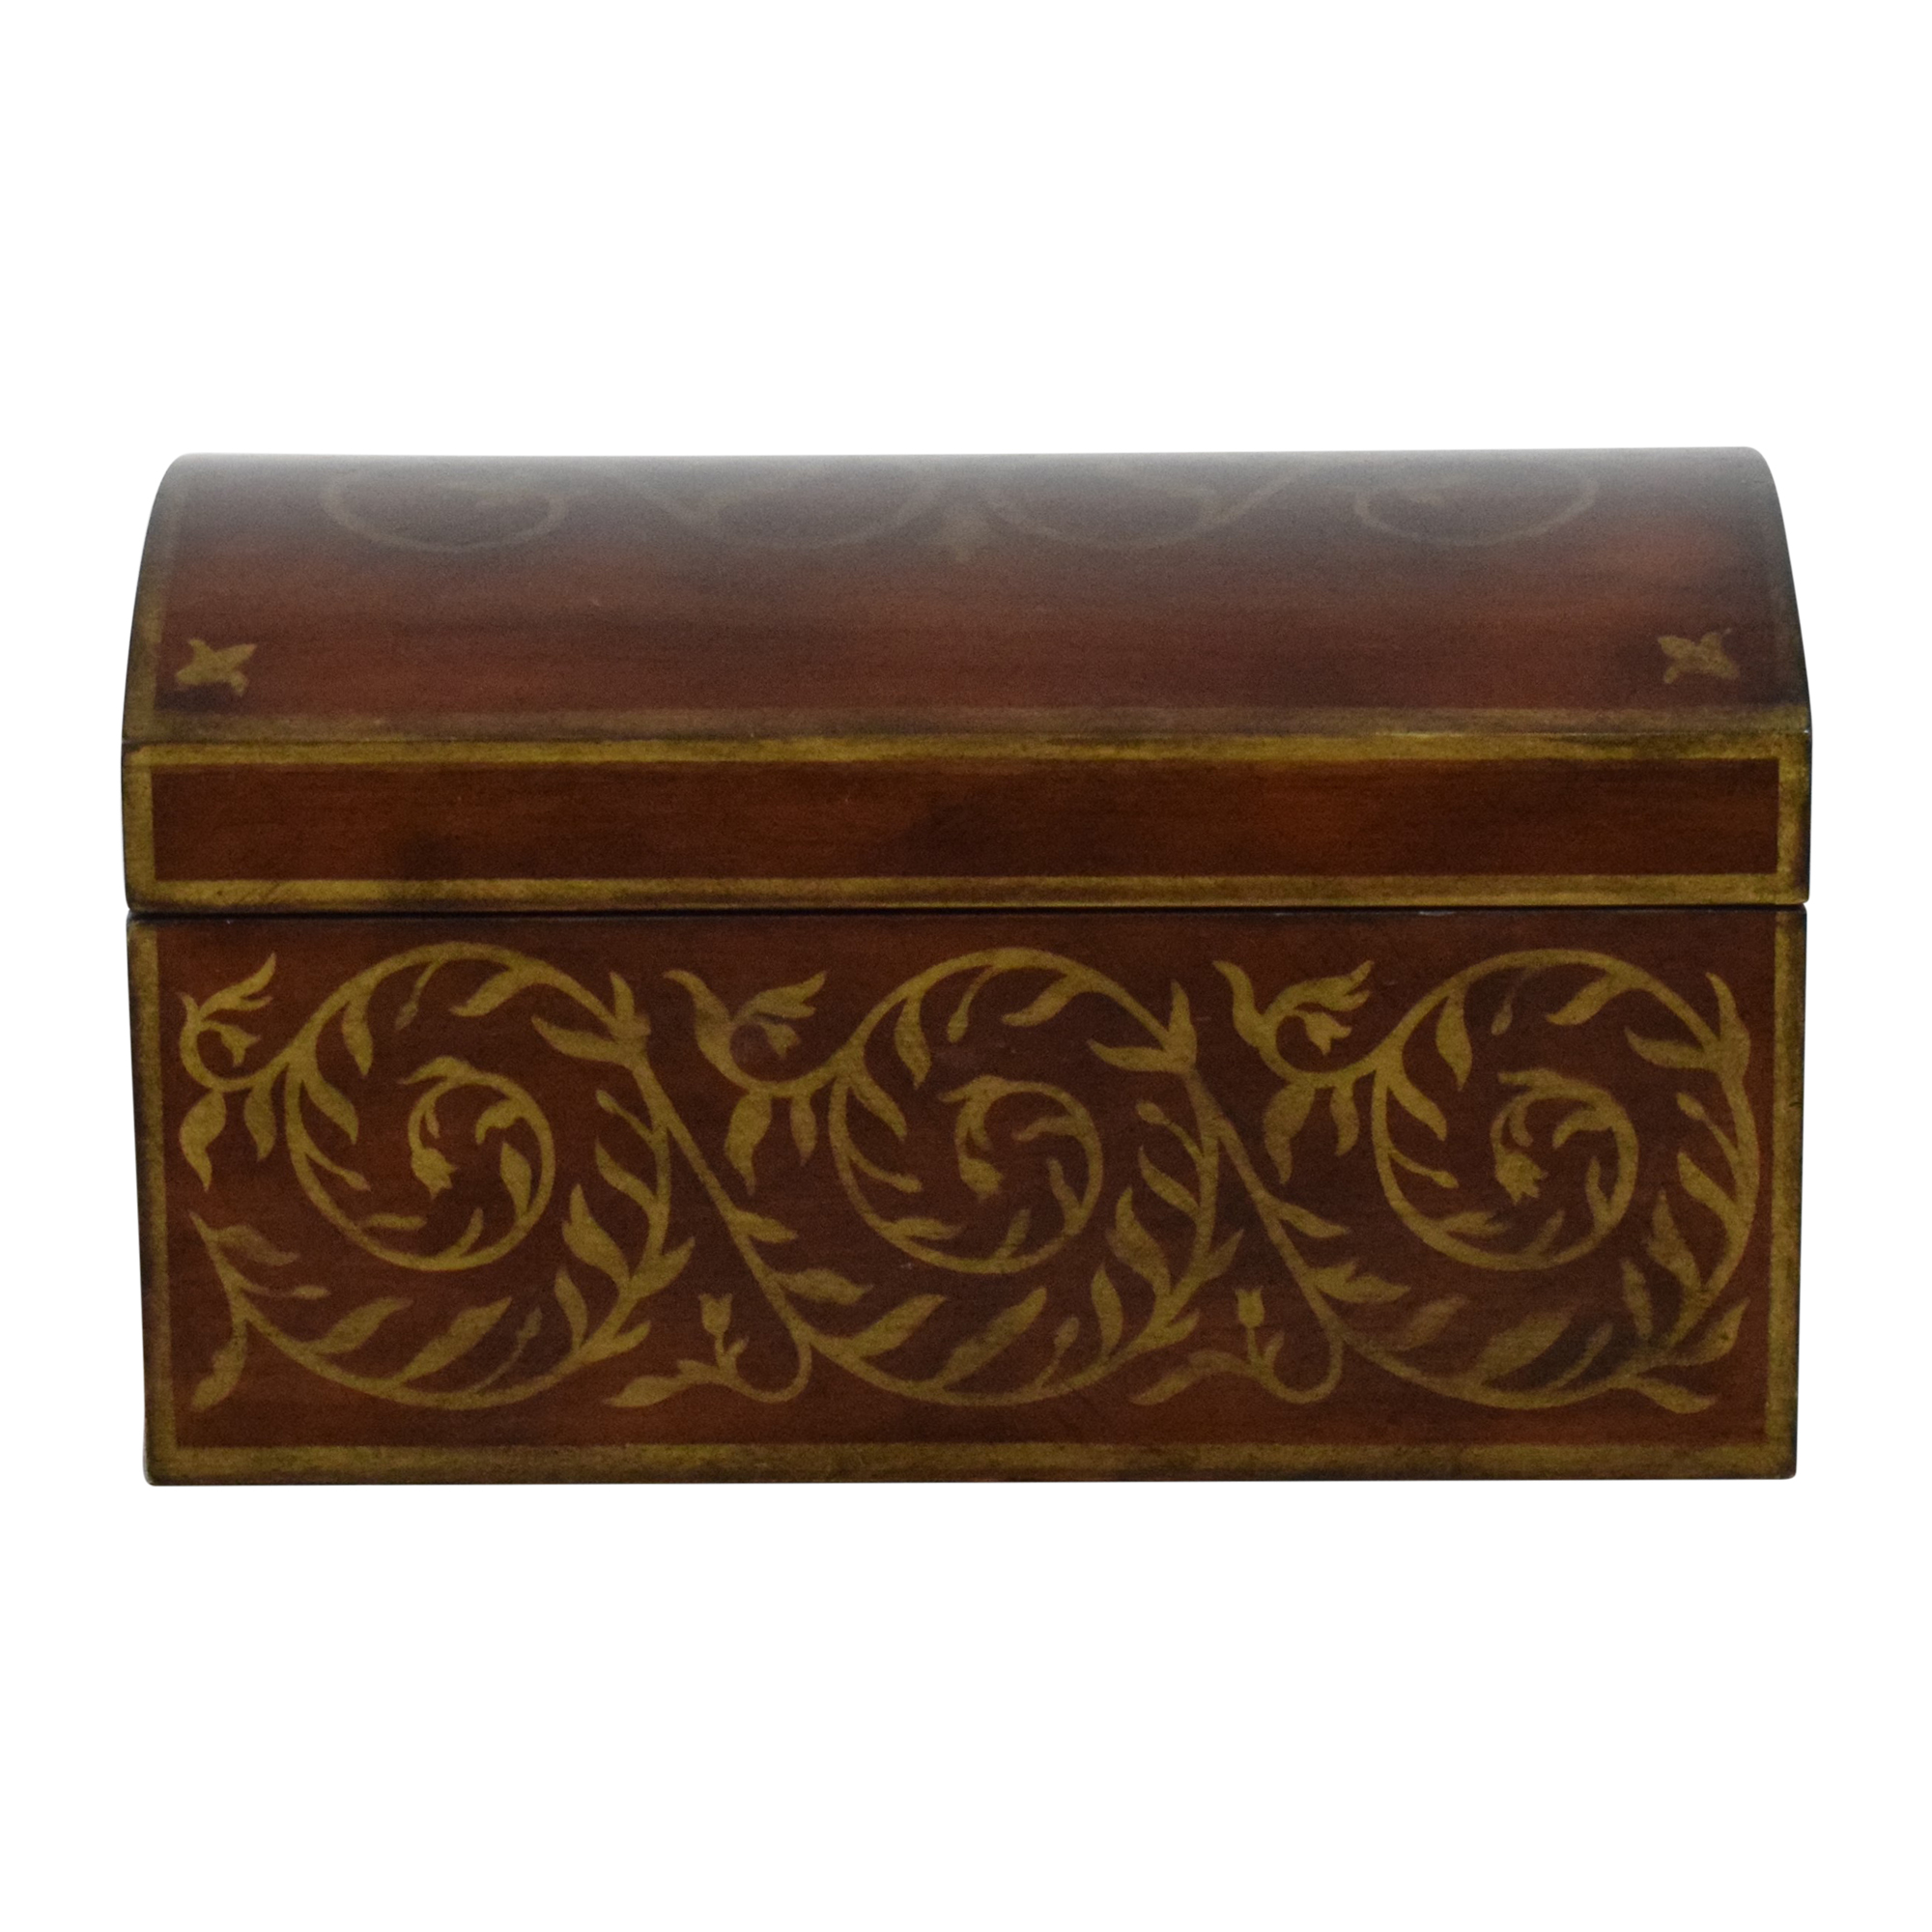 Ethan Allen Ethan Allen Dome Top Jewelry Box discount